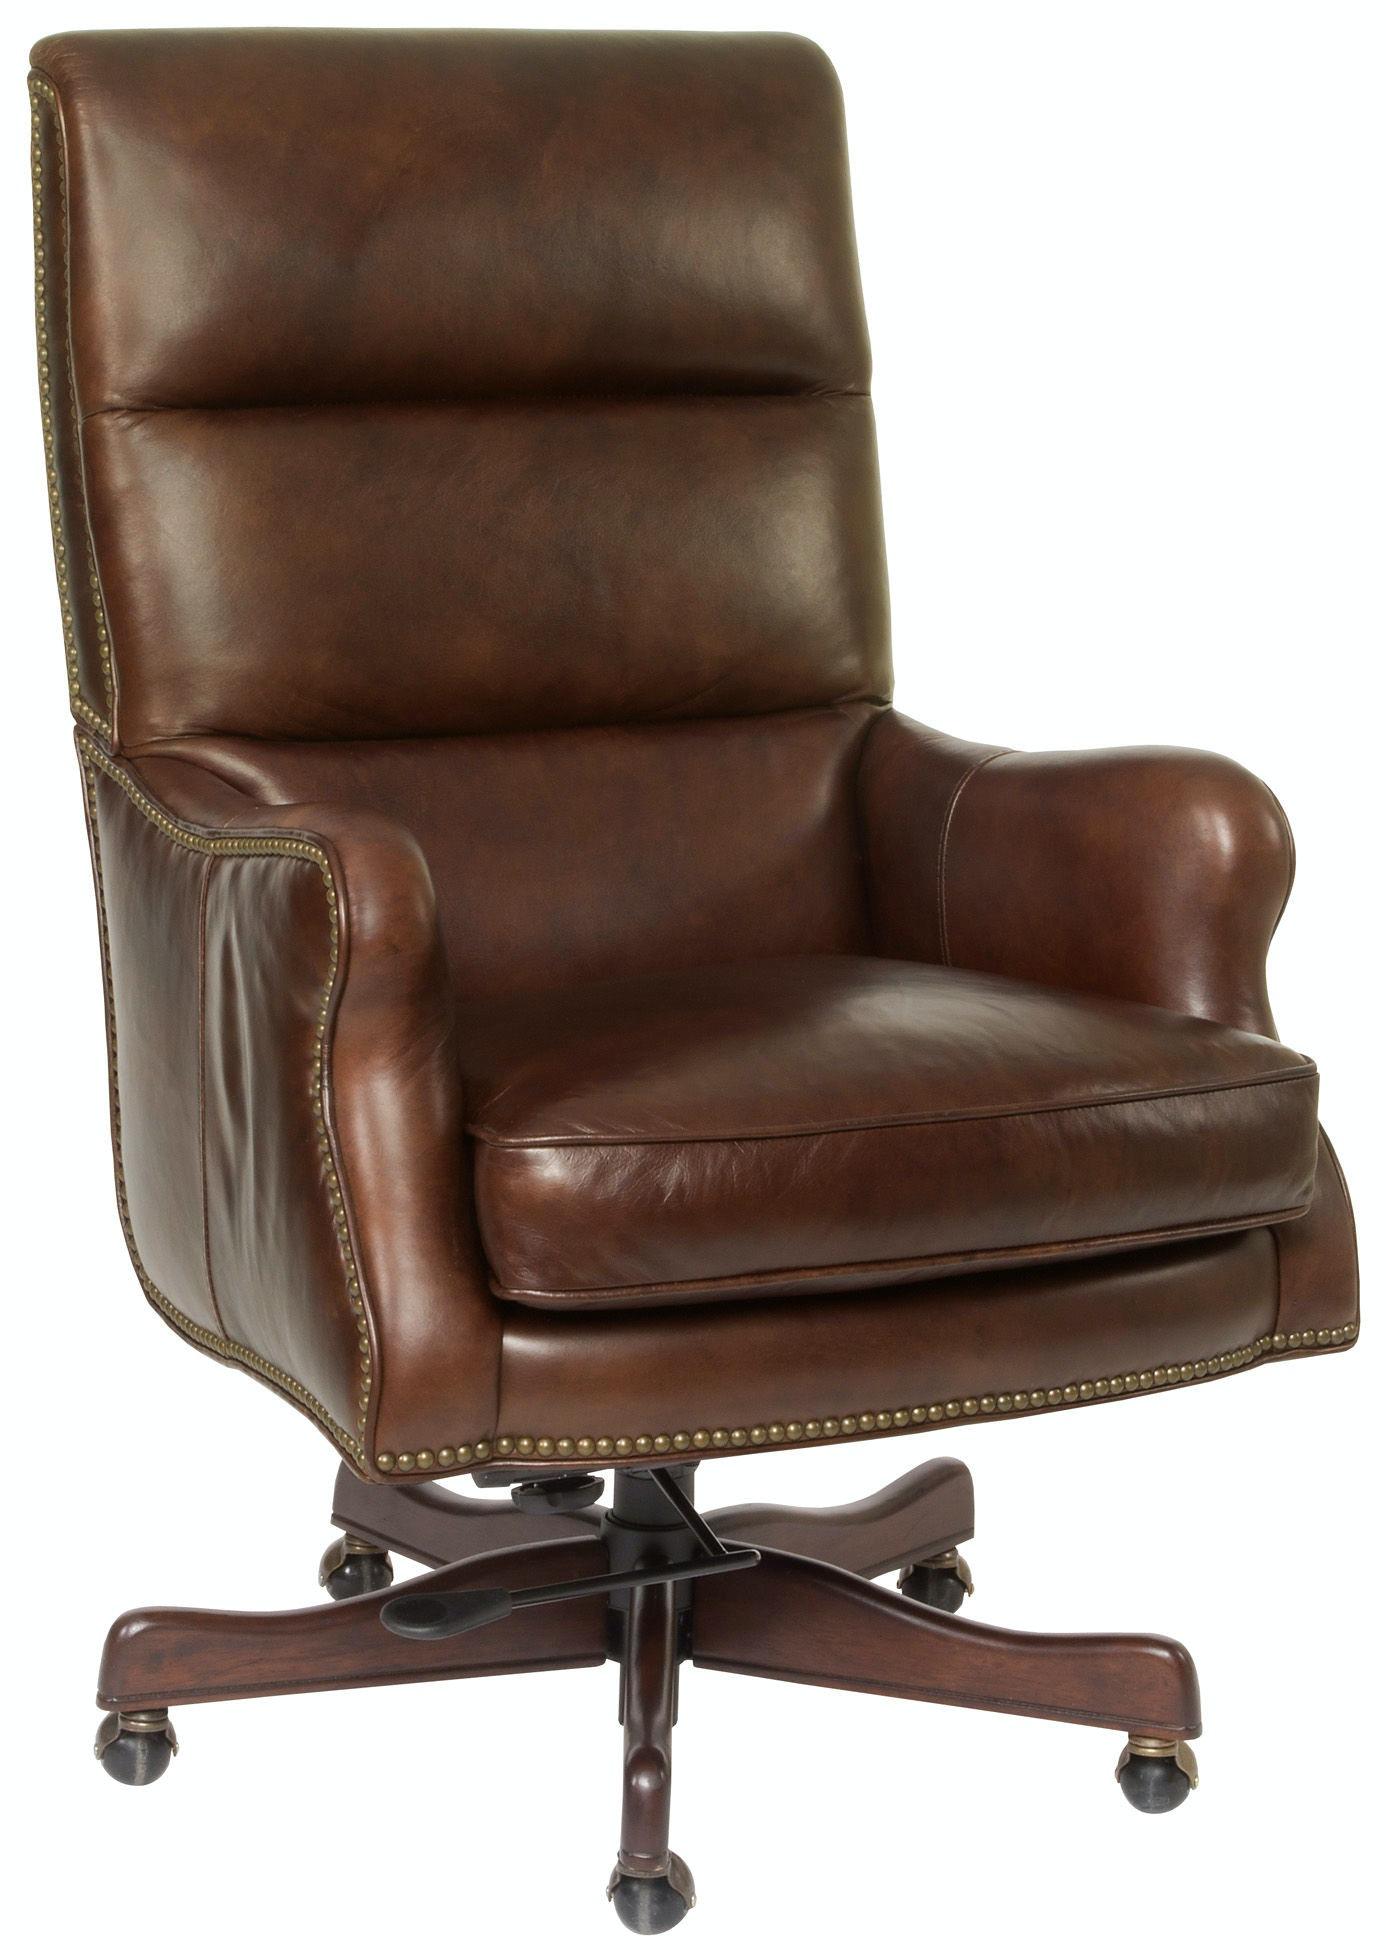 Hooker Furniture Victoria Executive Chair EC389 085